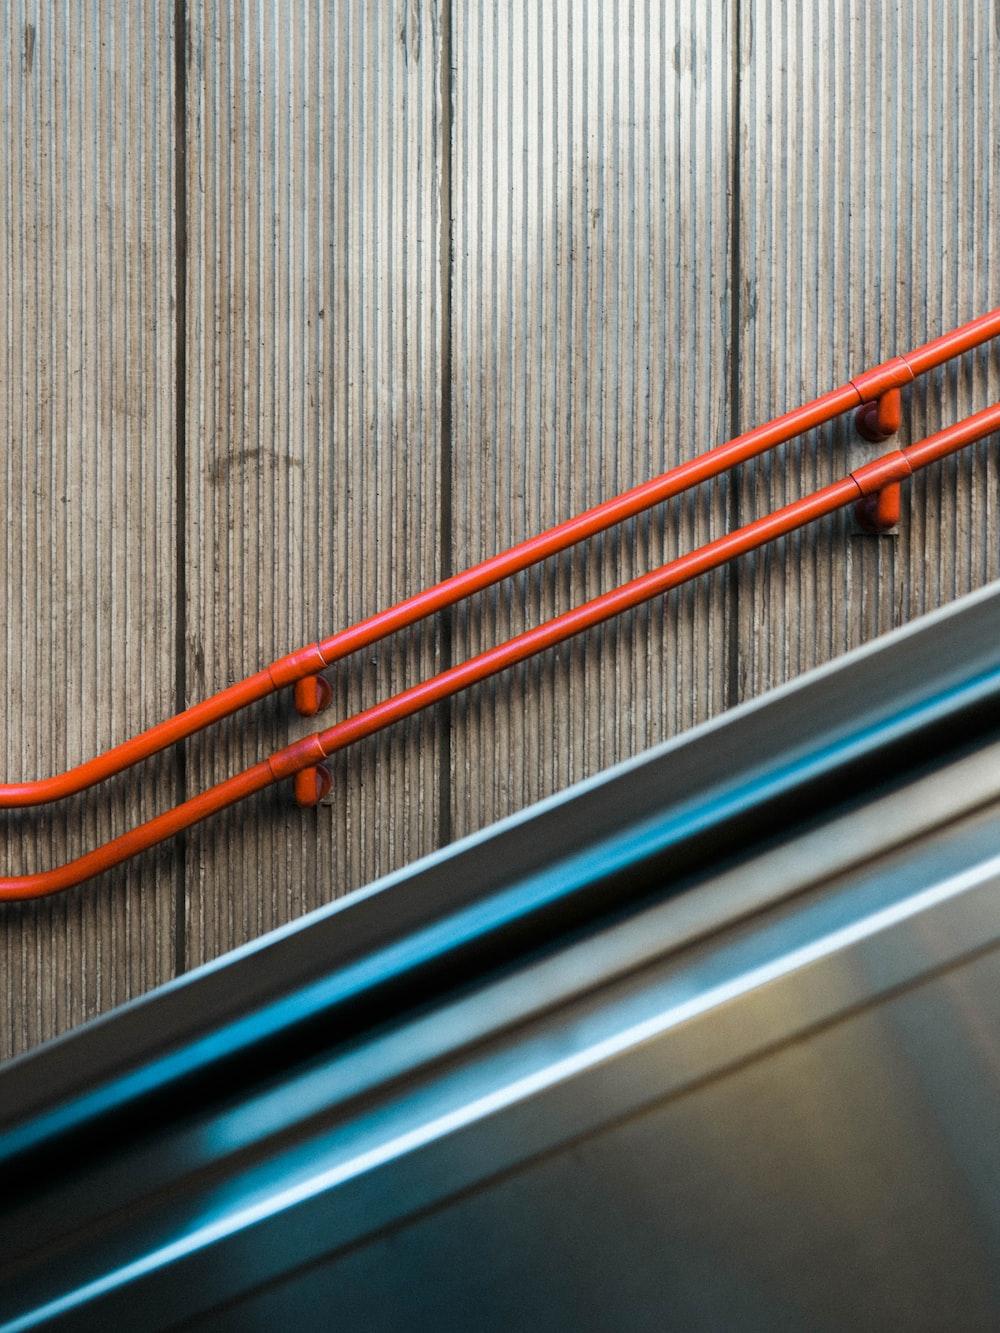 orange and black metal railings